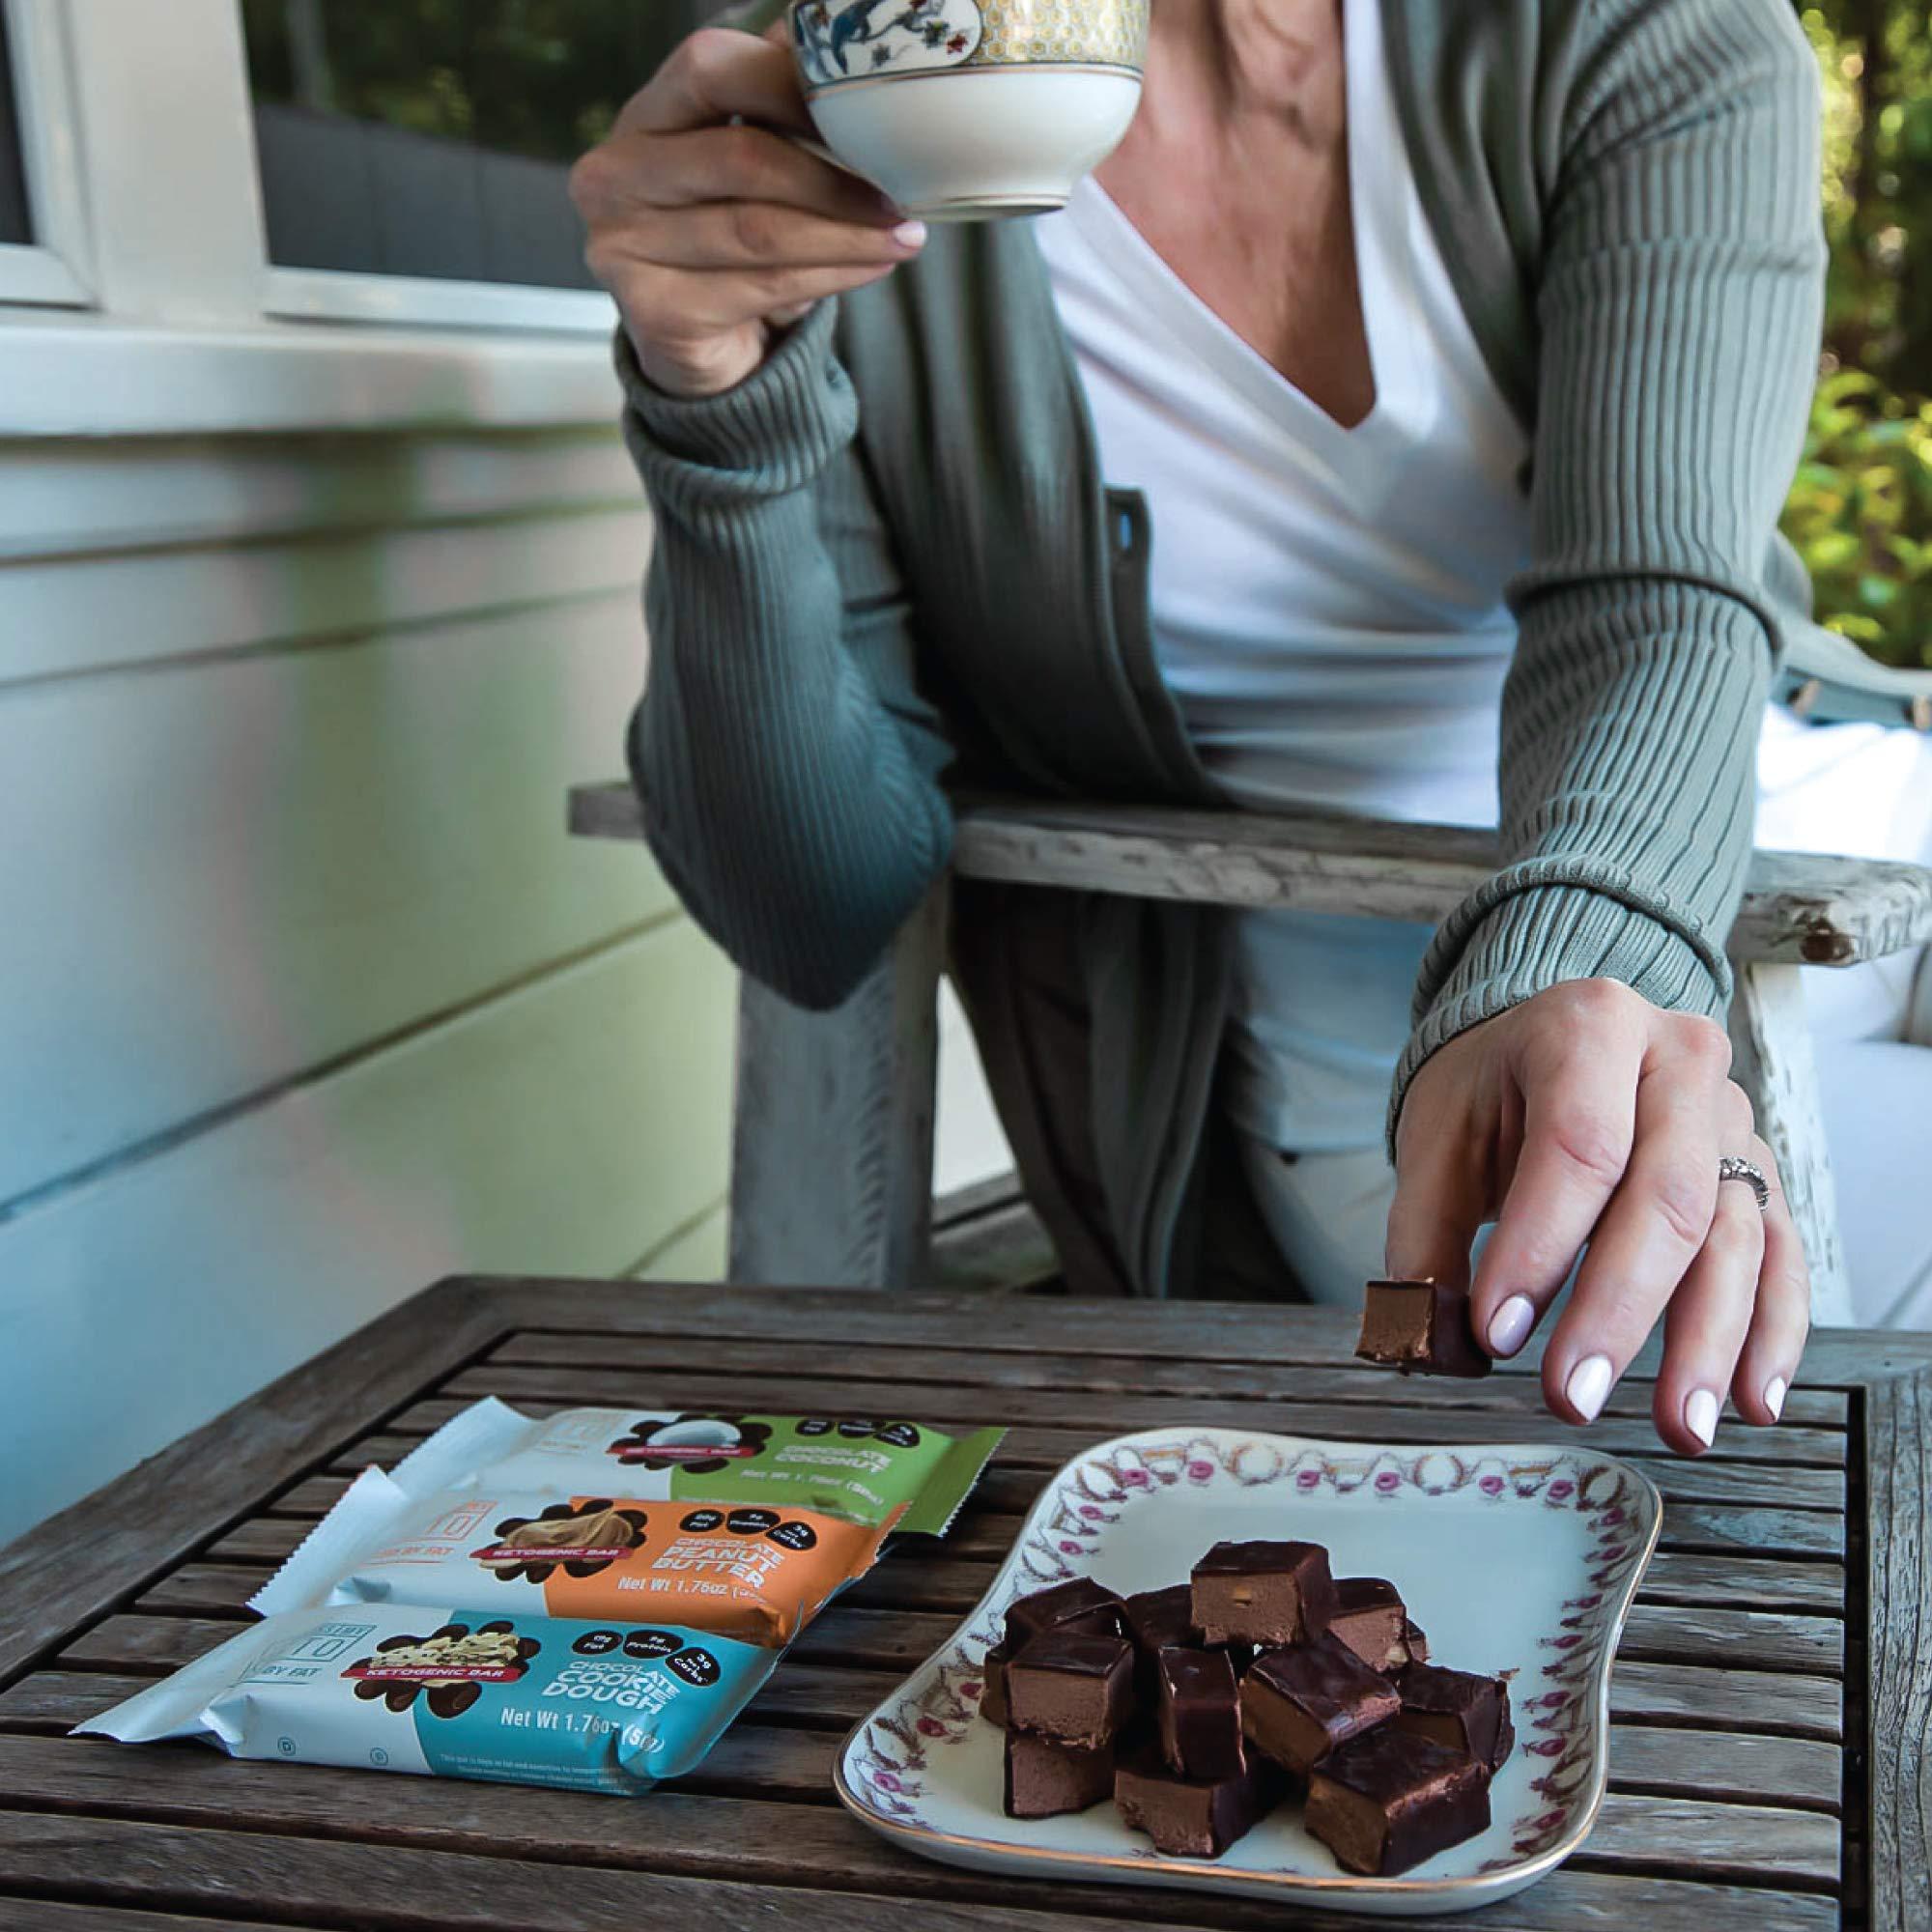 Kiss My Keto Snacks Keto Bars - Keto Chocolate Variety (3 Pack, 36 Bars), Nutritional Keto Food Bars, Paleo, Low Carb/Glycemic Keto Friendly Foods, All Natural On-The-Go Snacks, Low Net Carbs by Kiss My Keto